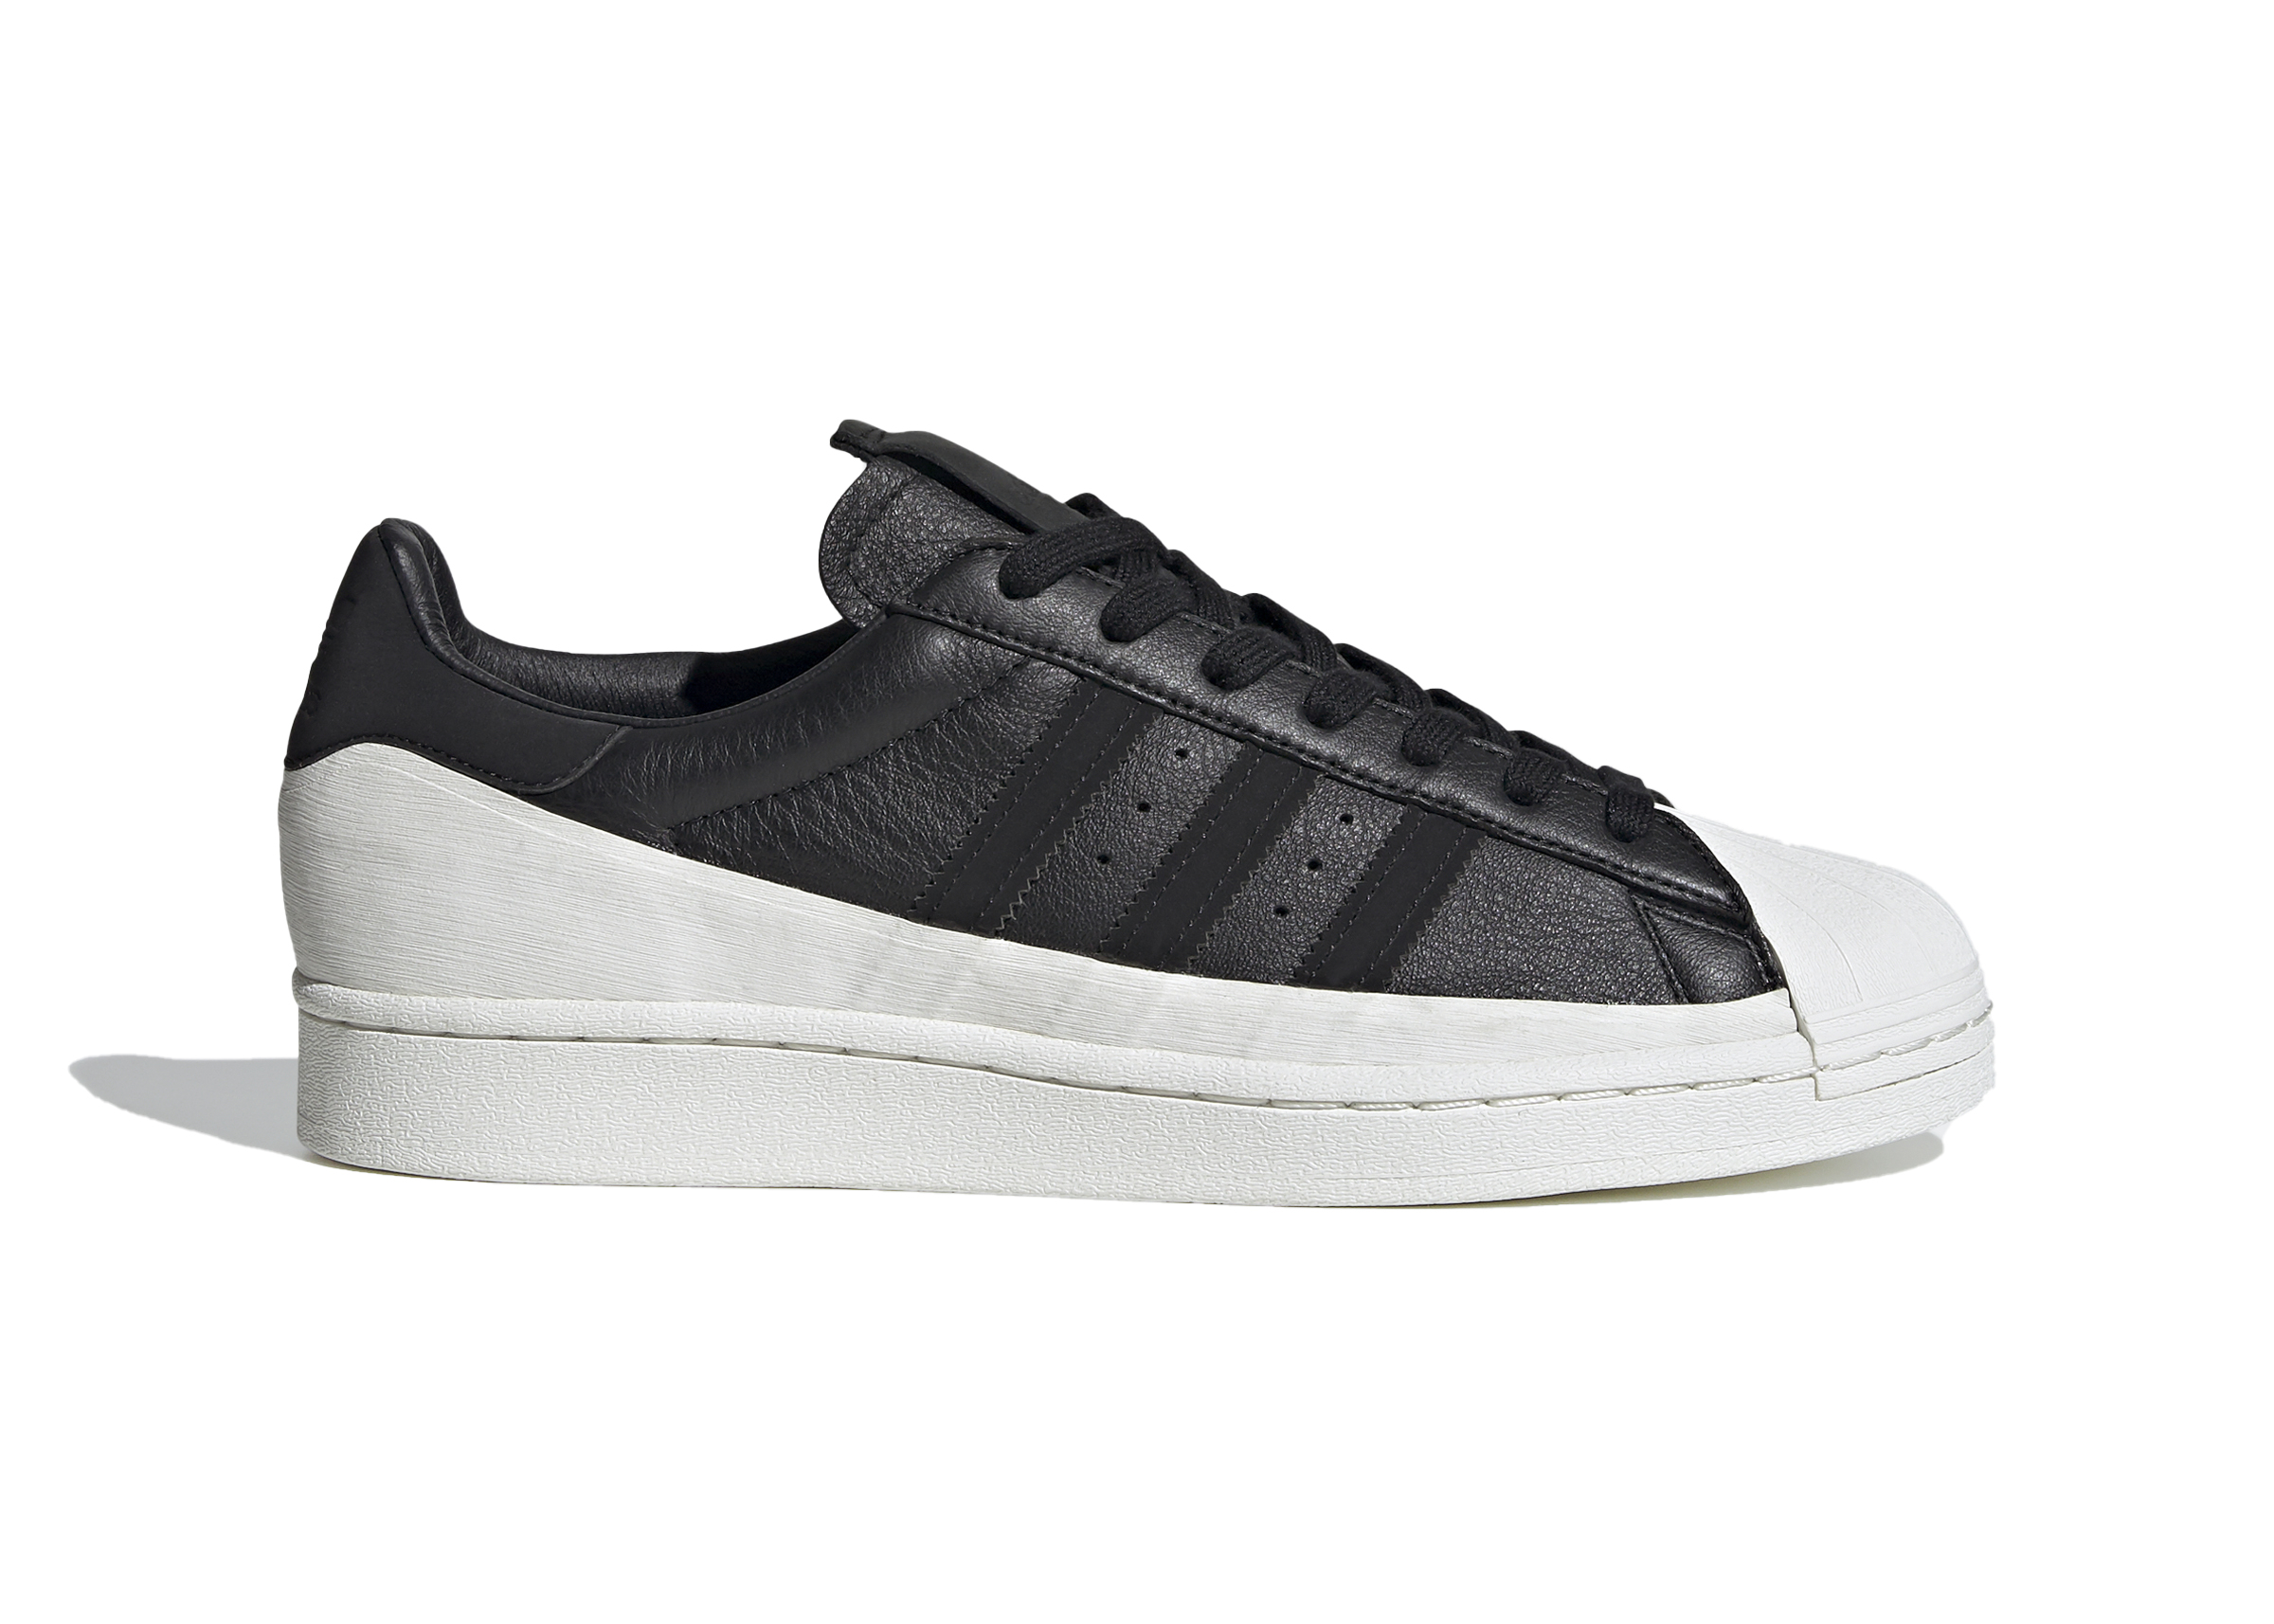 Adidas Superstar MG Core BlackOff White FV3025